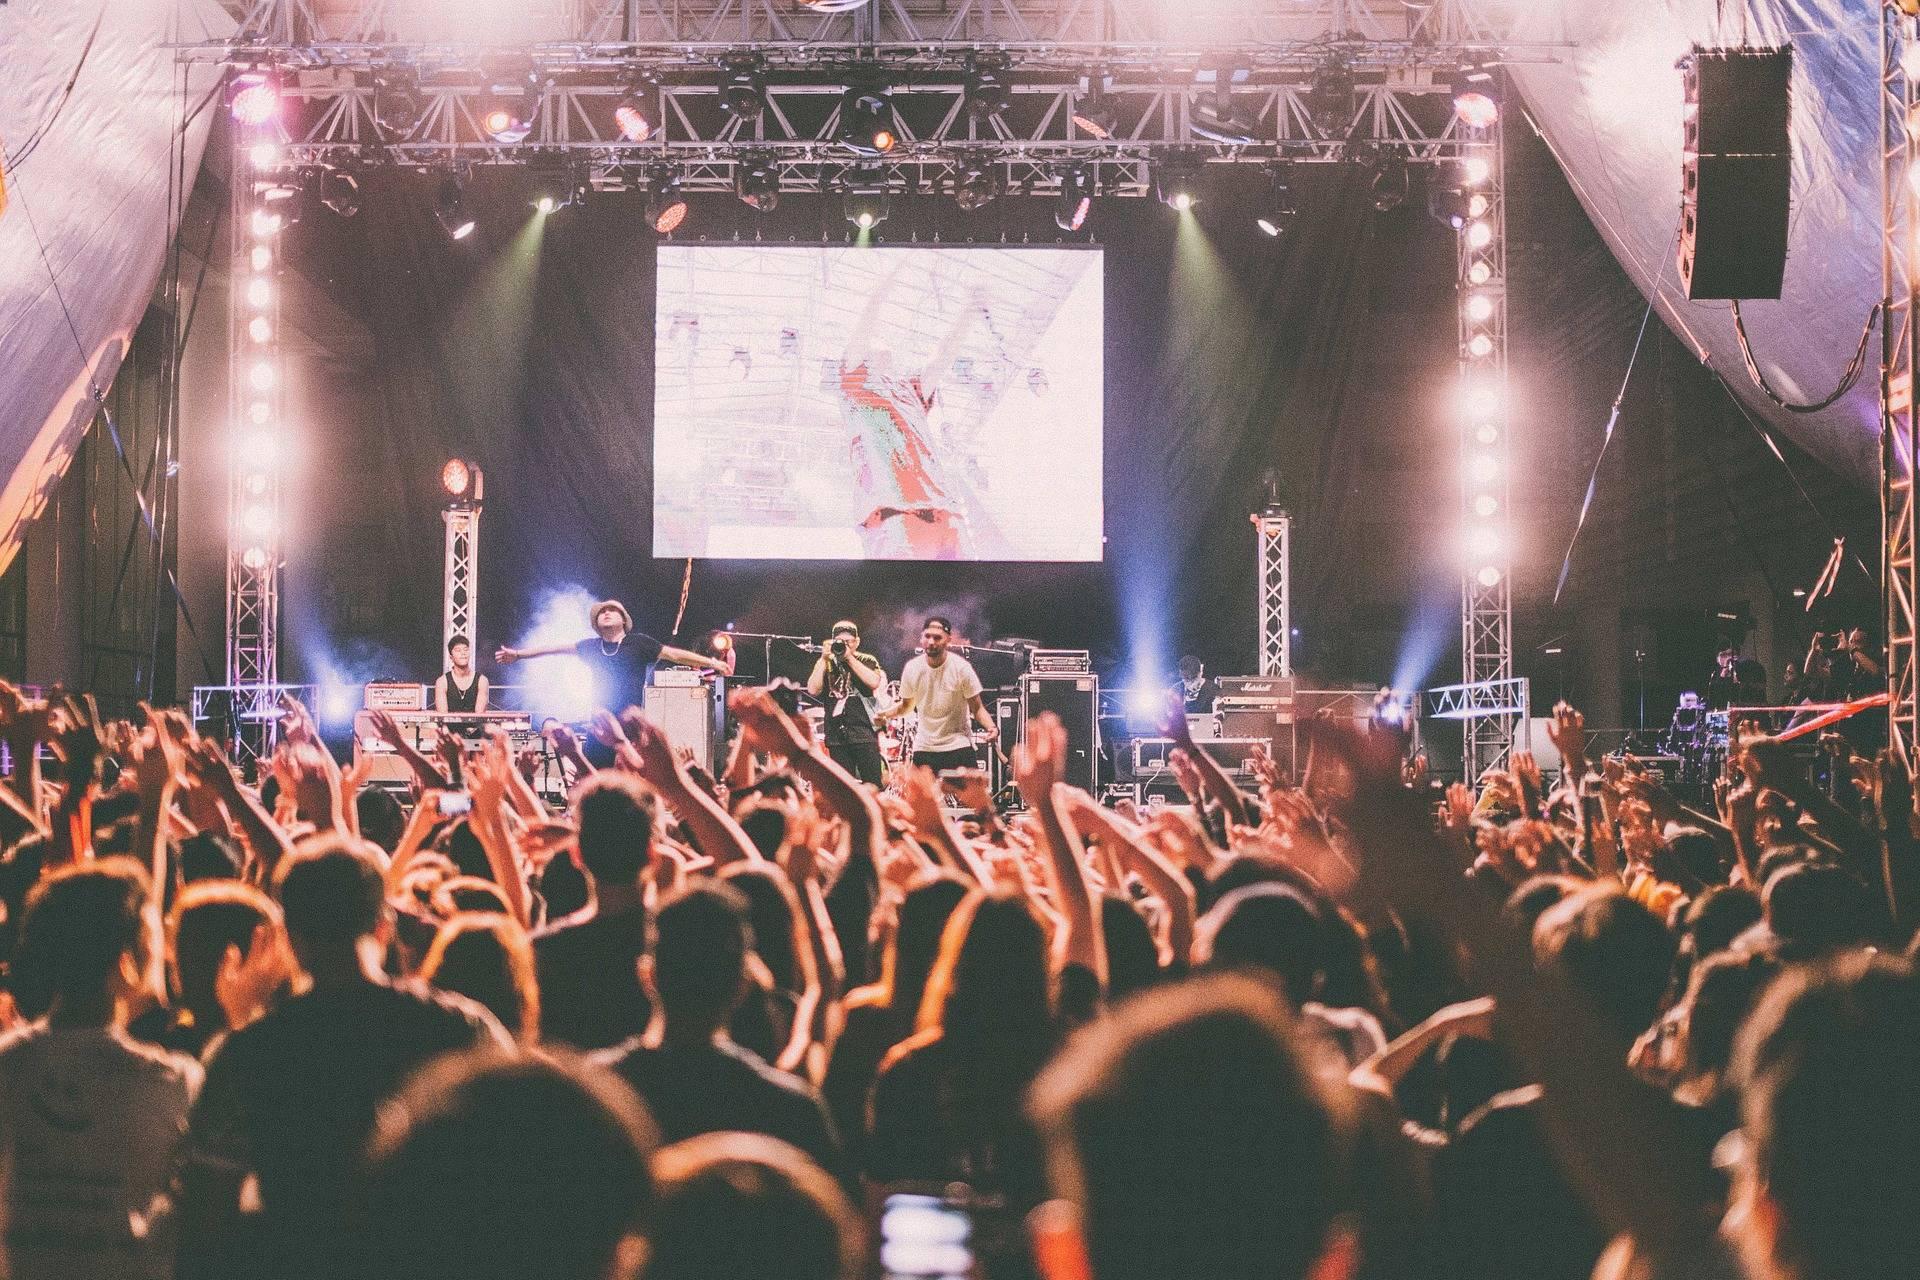 pantallas digitales led gigantes para grupos musicales